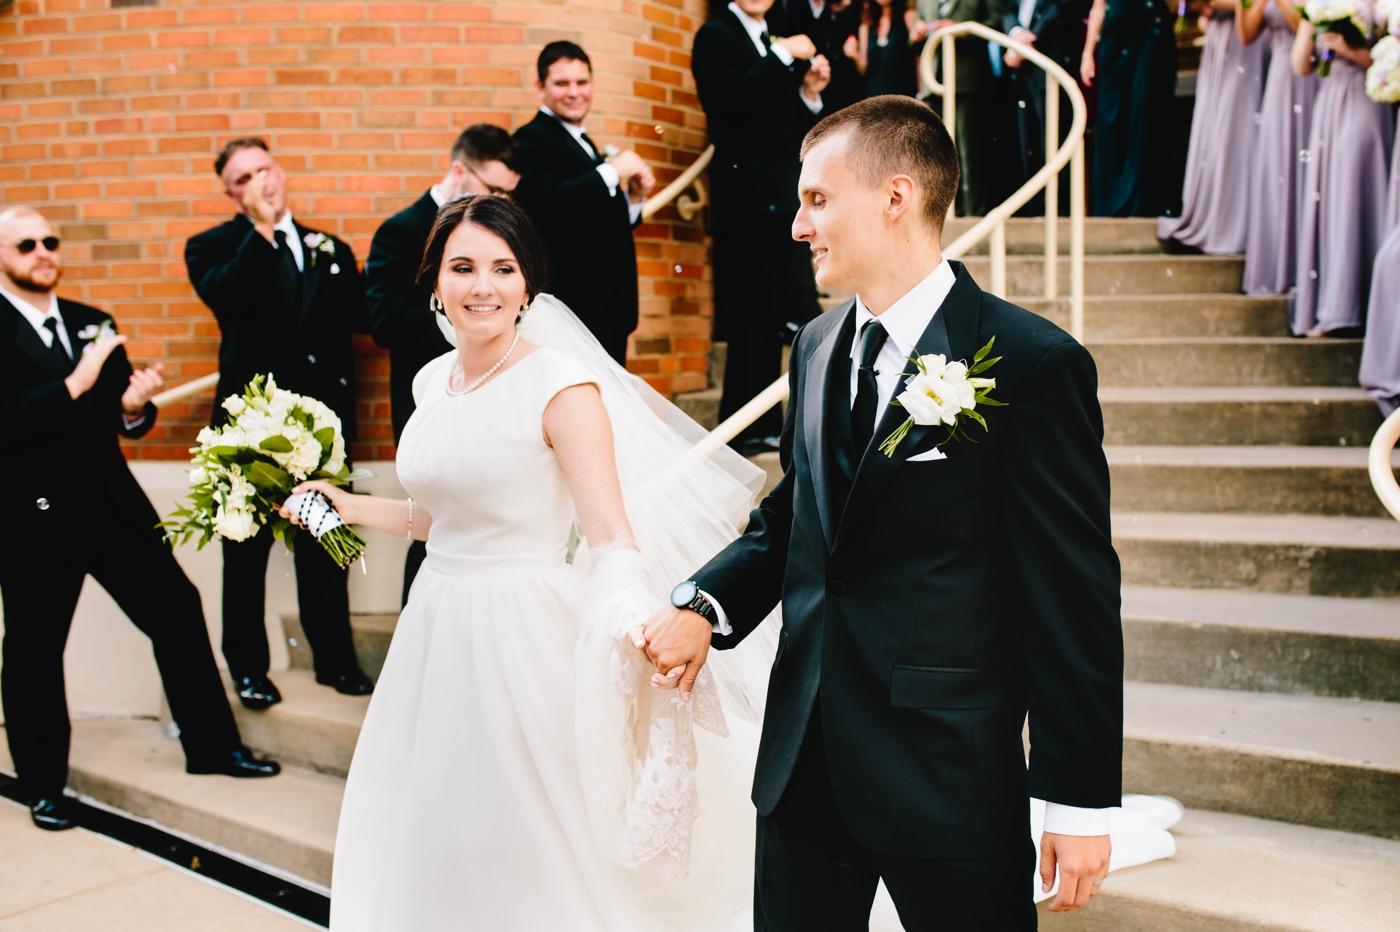 chicago-fine-art-wedding-photography-mccarthy56